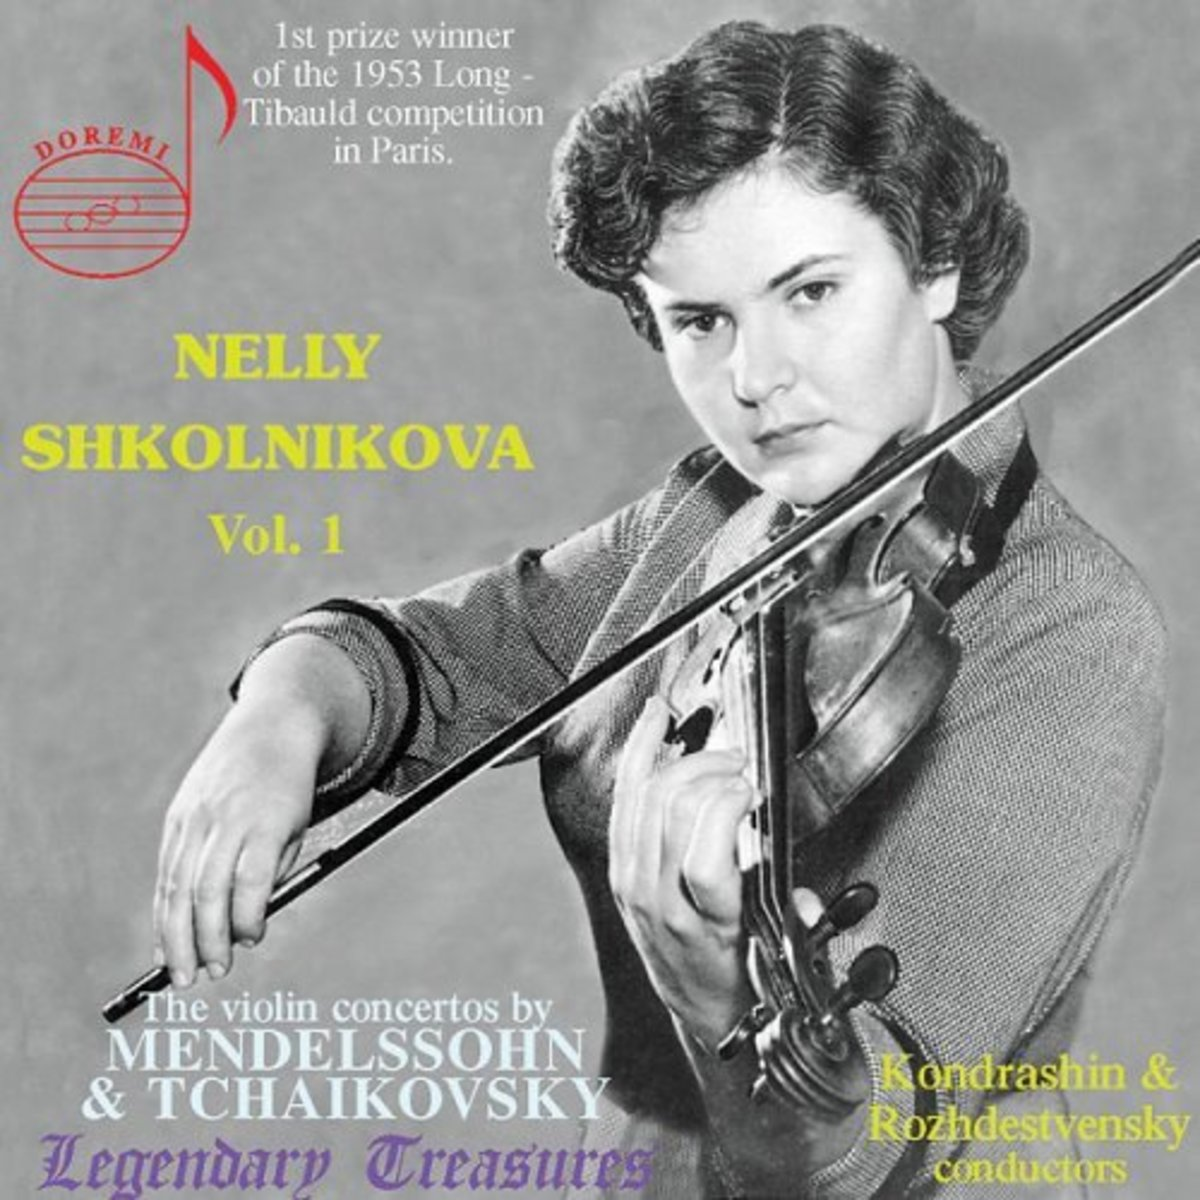 Nelli Shkolnikova (ca. 1927   2 February 2010) - cancer deaths